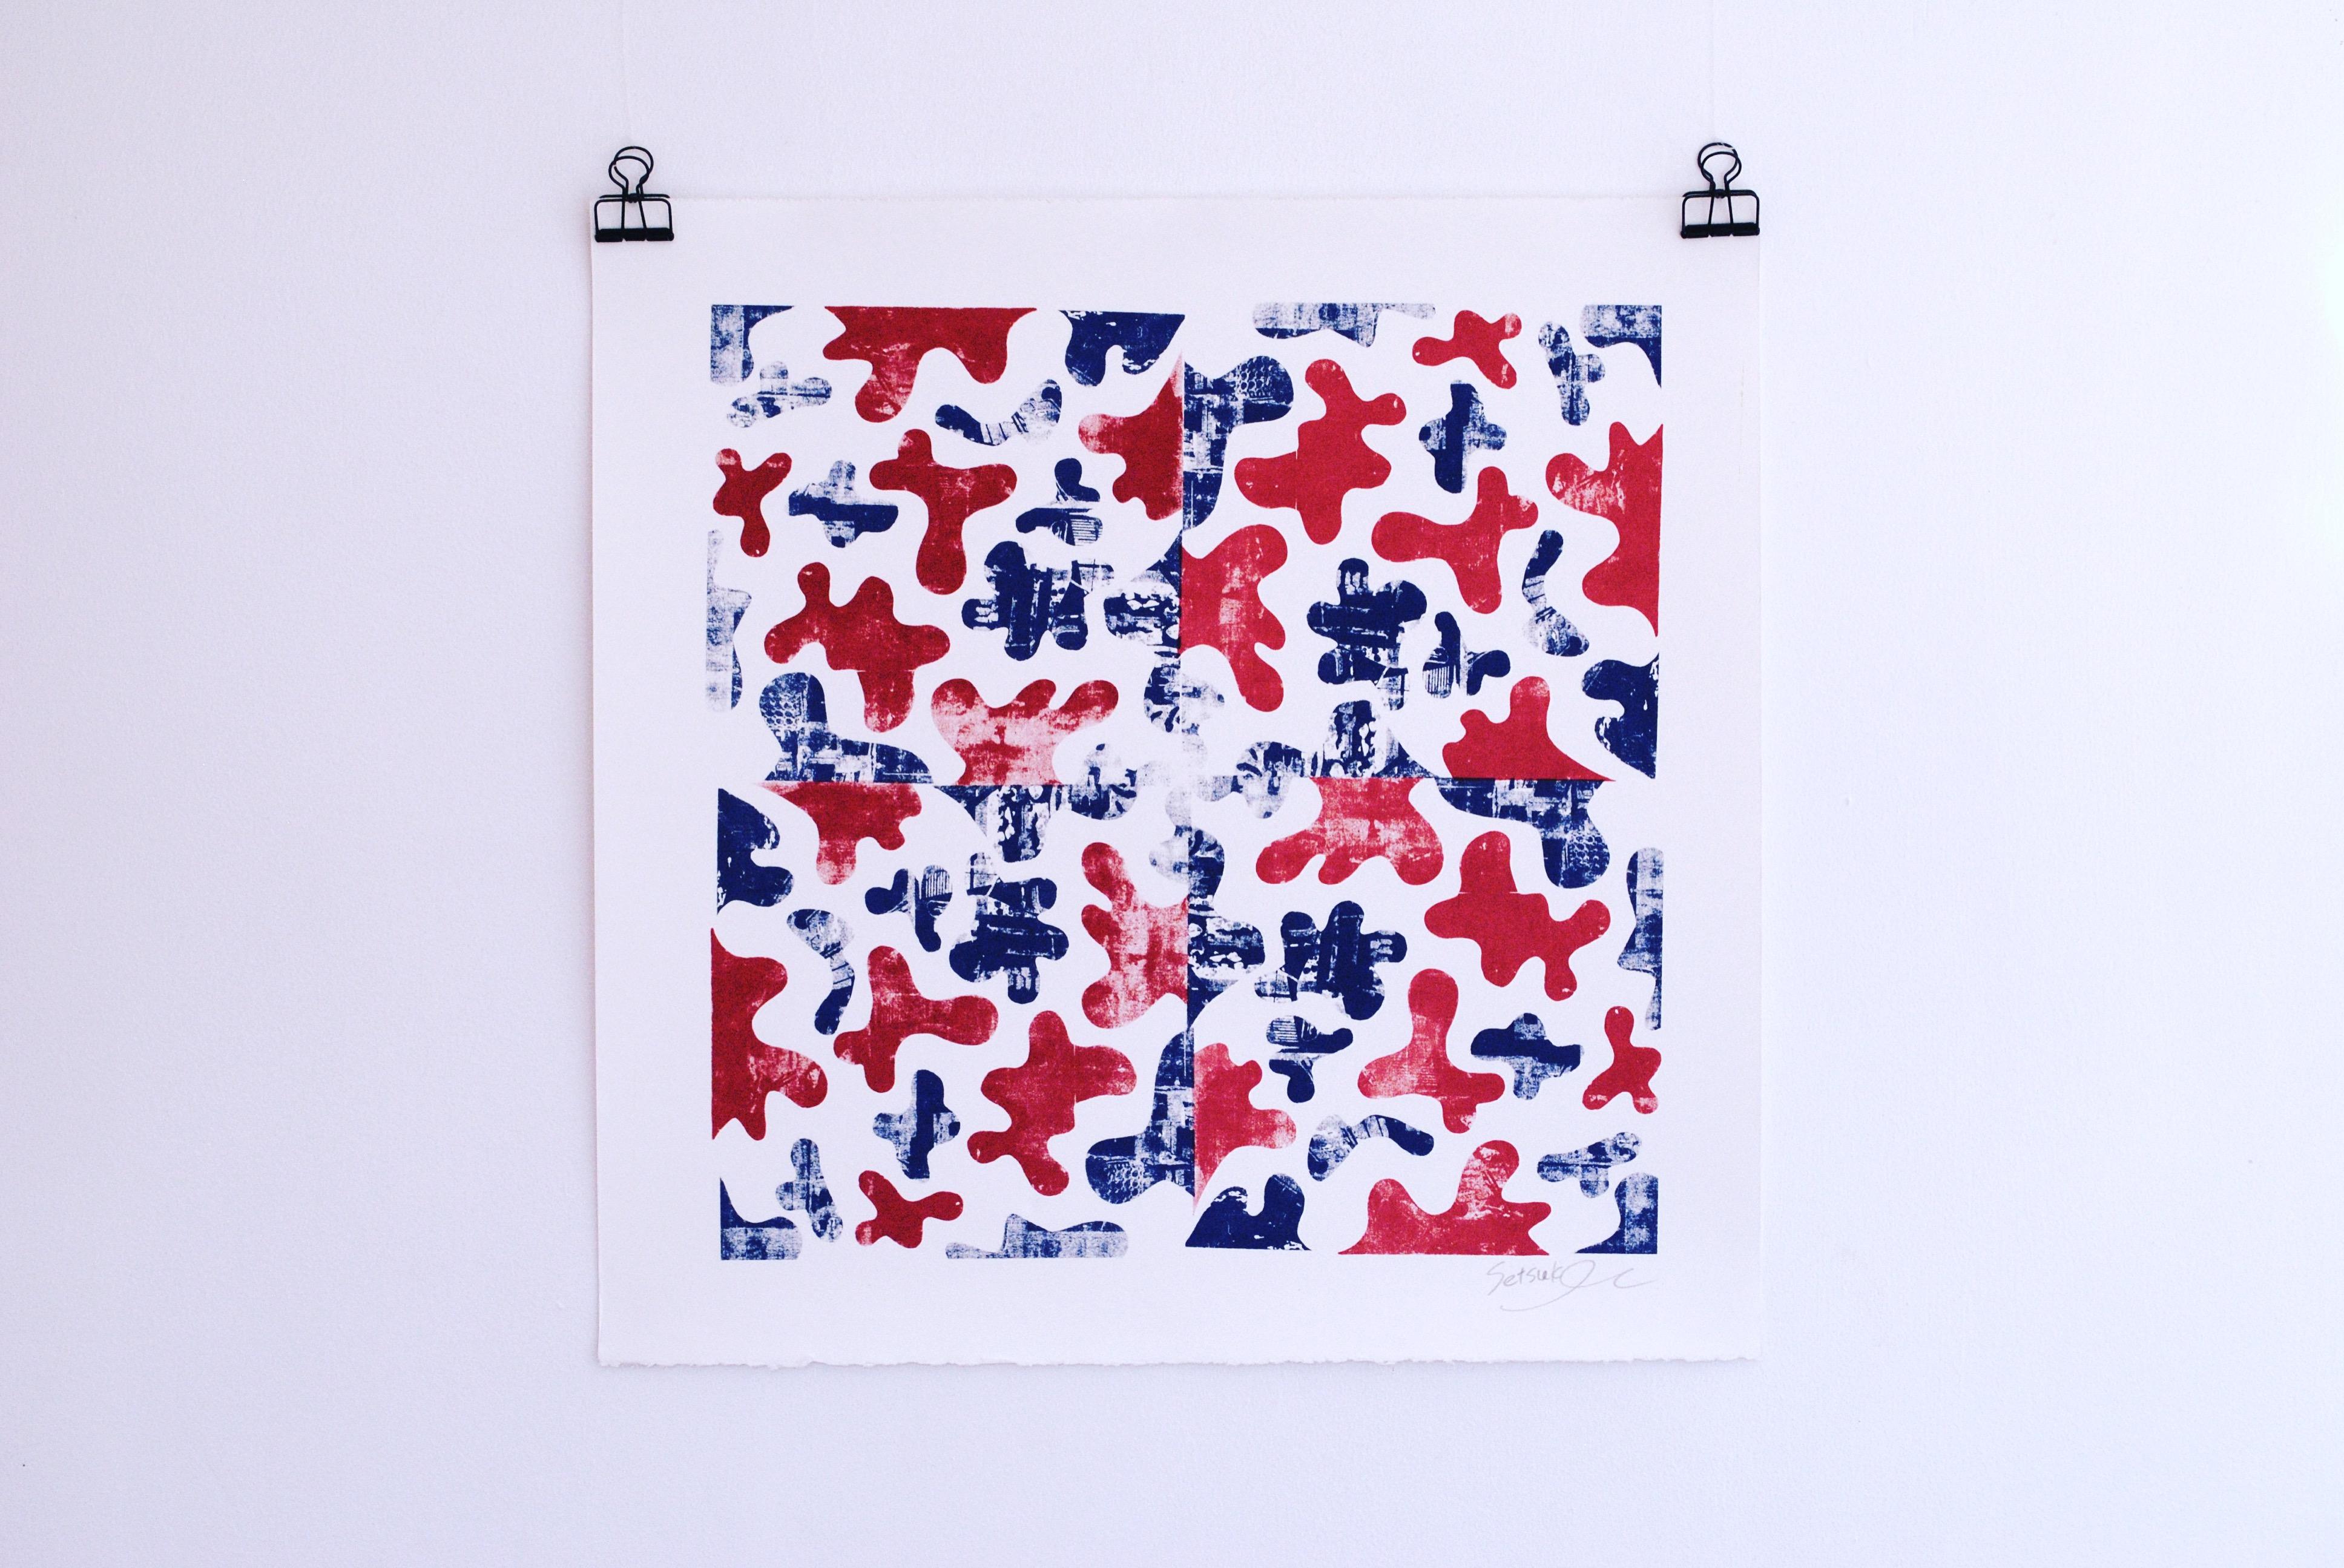 Monoprint on paper. 500 x 500 mm